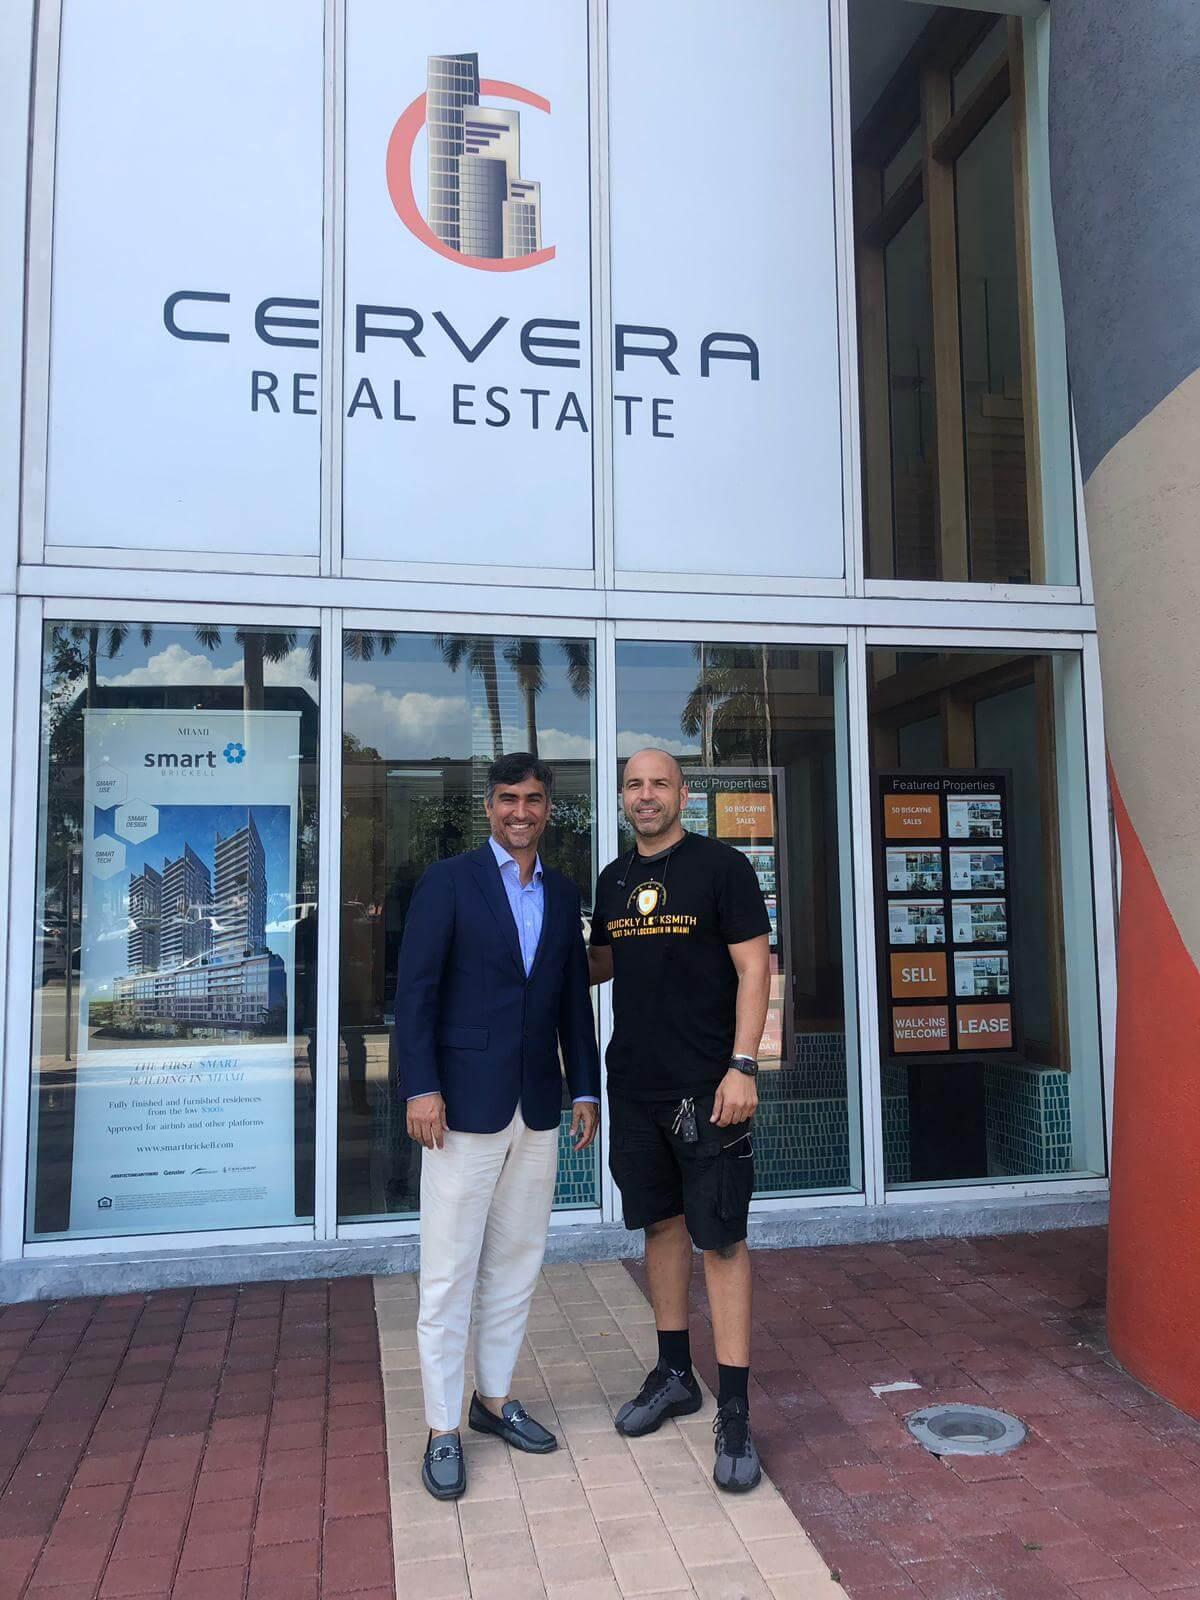 Miami locksmith service for real estate agents